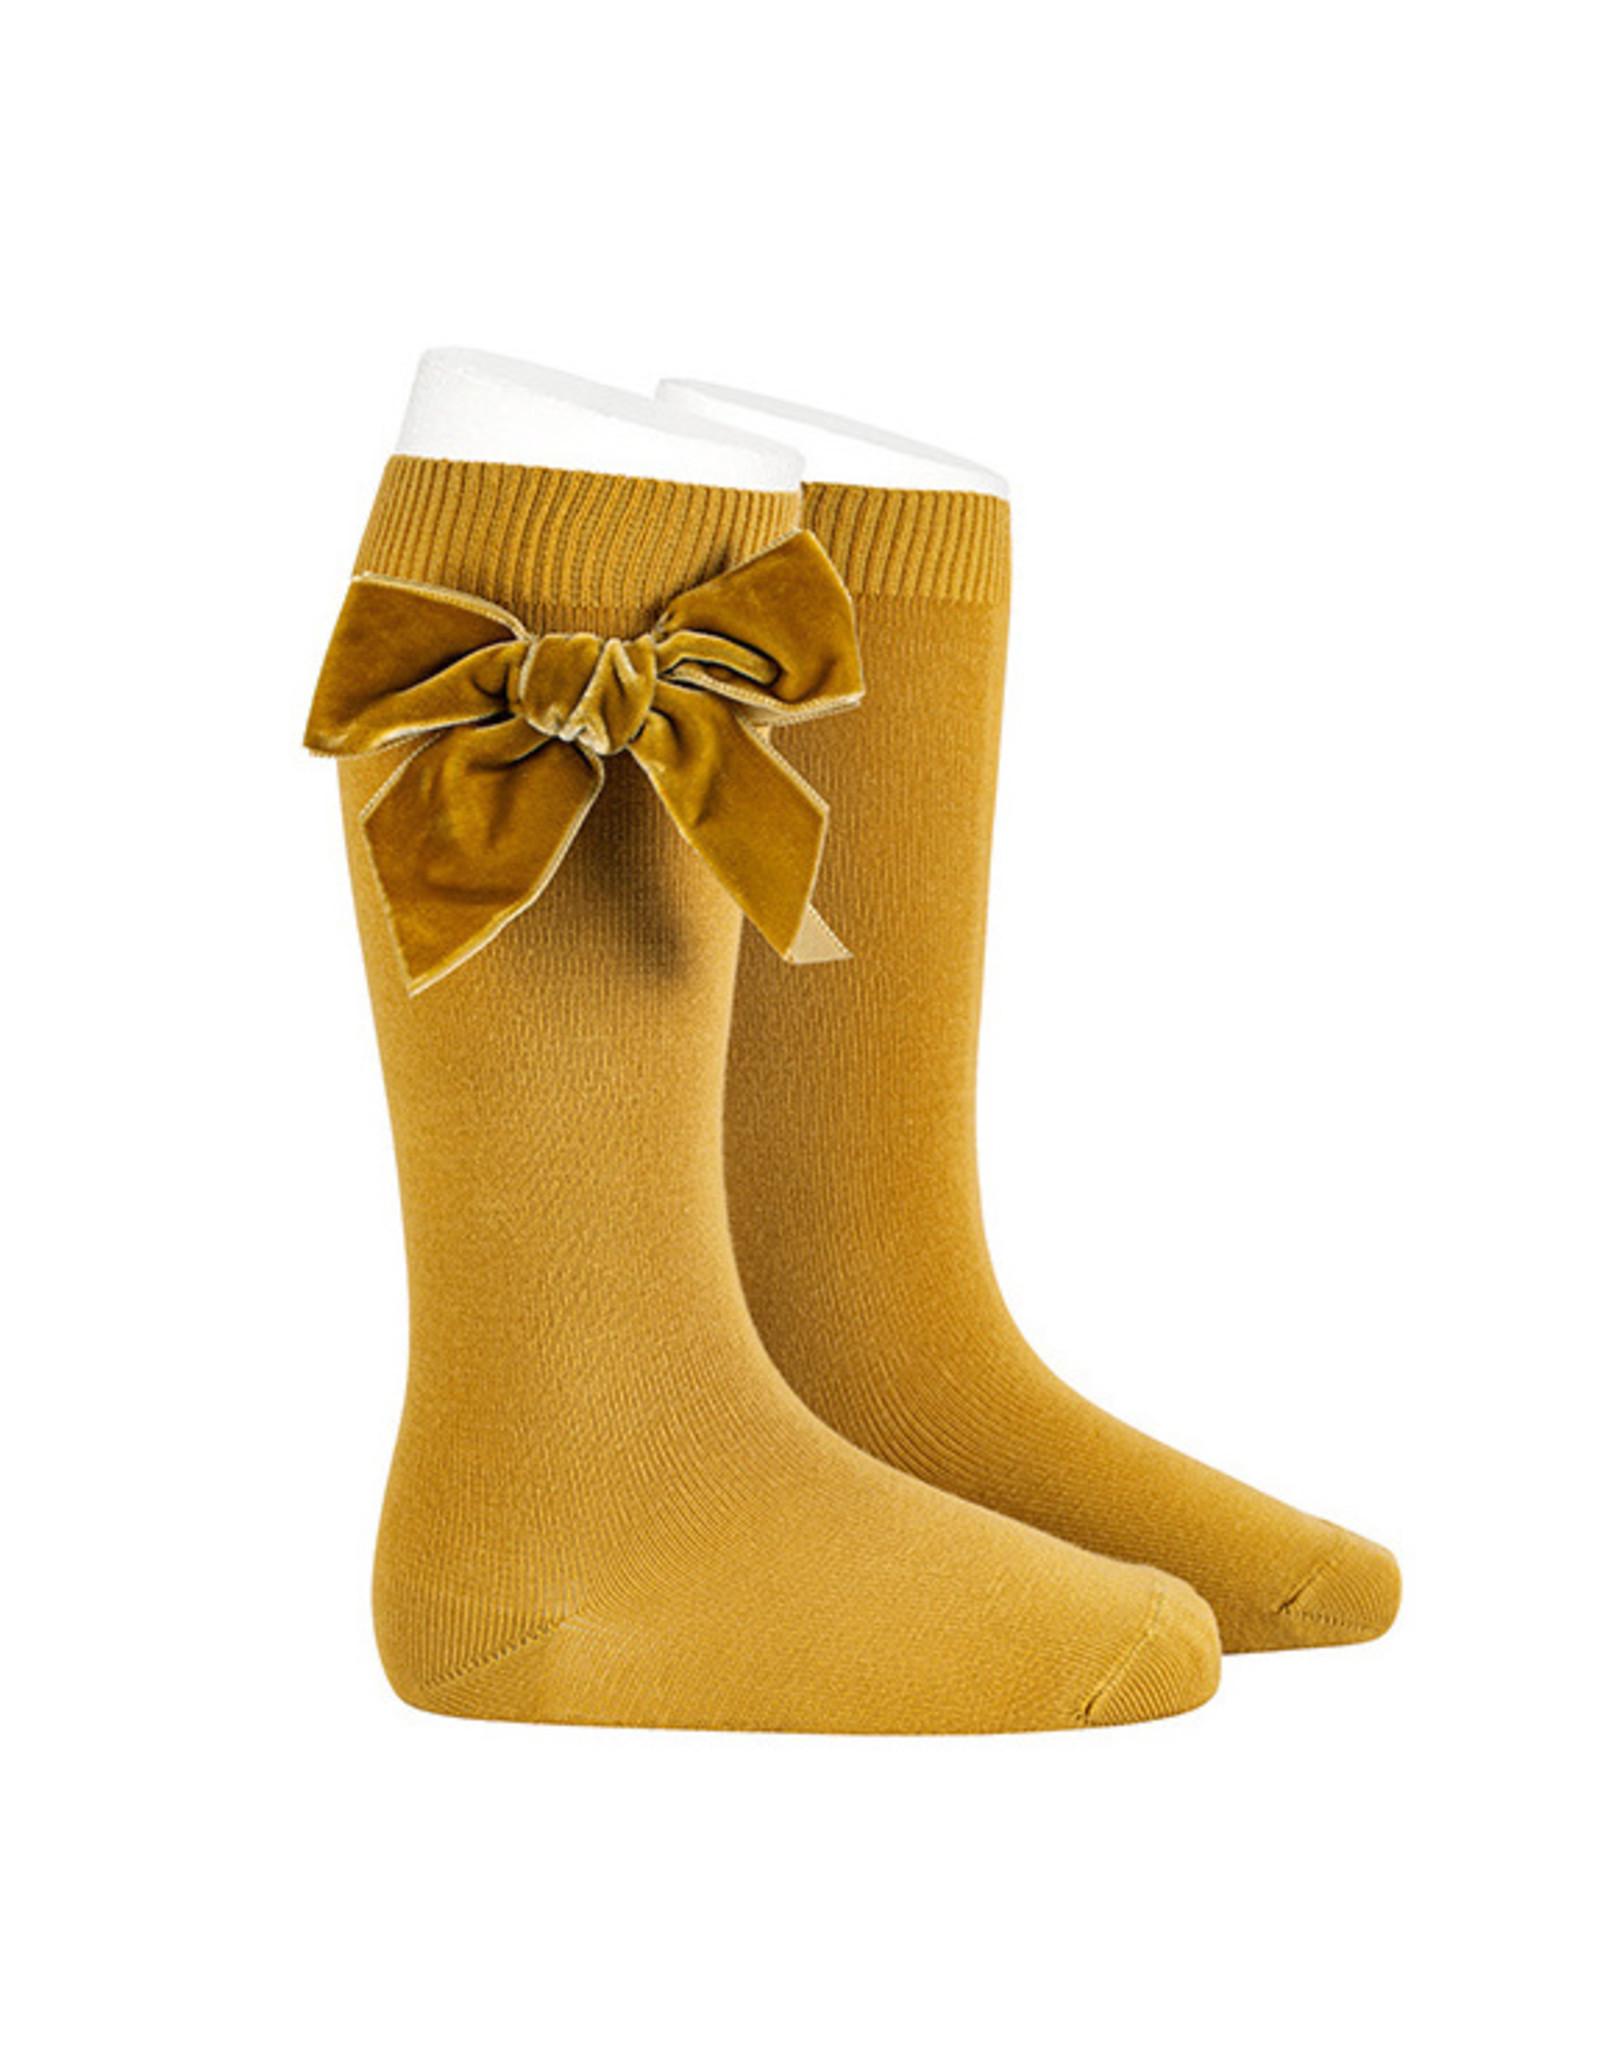 CONDOR Mustard Velvet Bow Socks